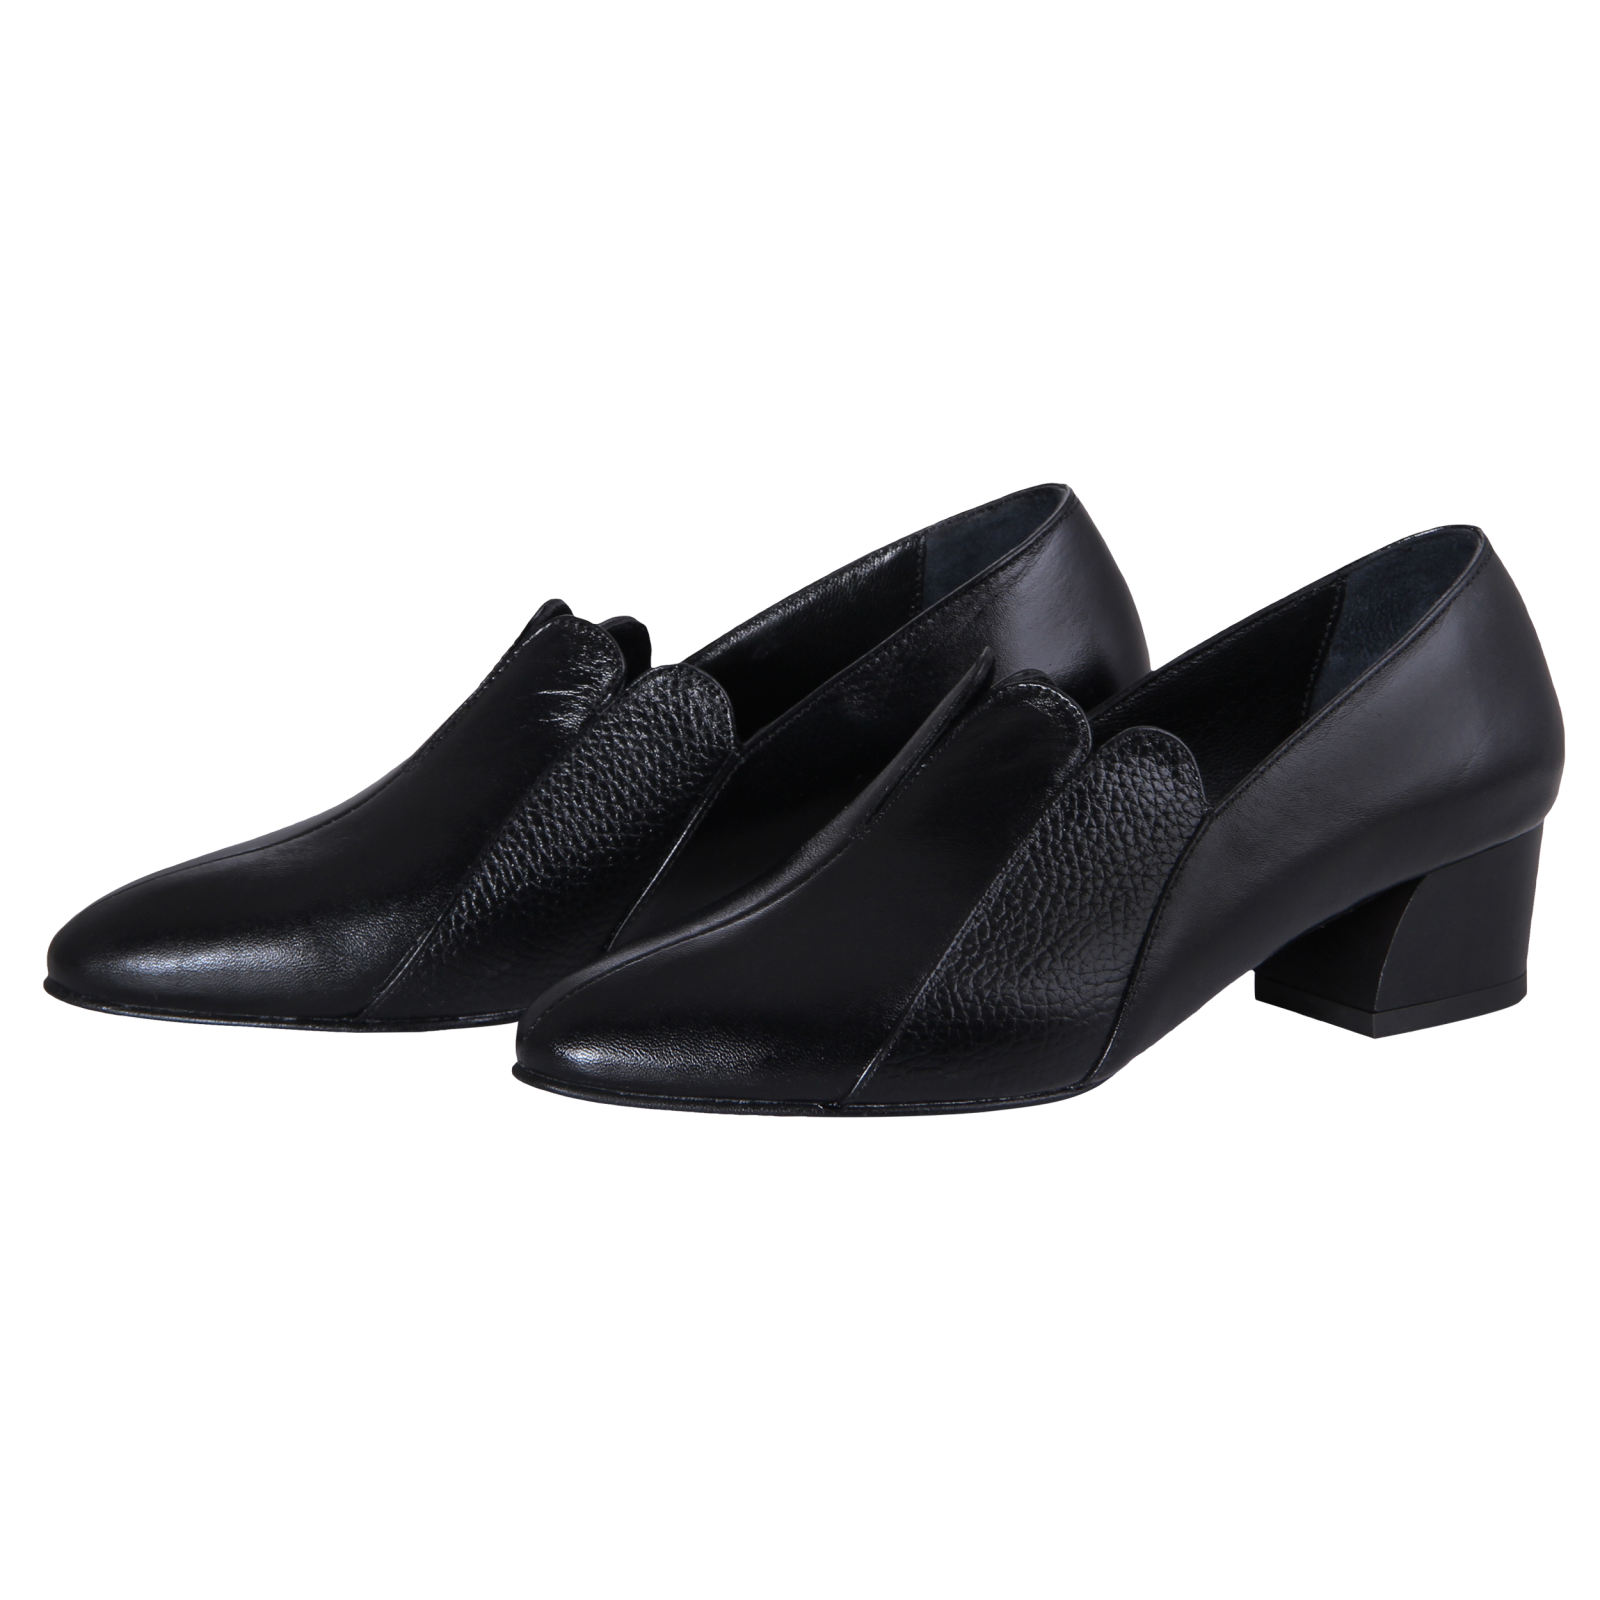 کفش زنانه شهر چرم کد 1-39969 -  - 6